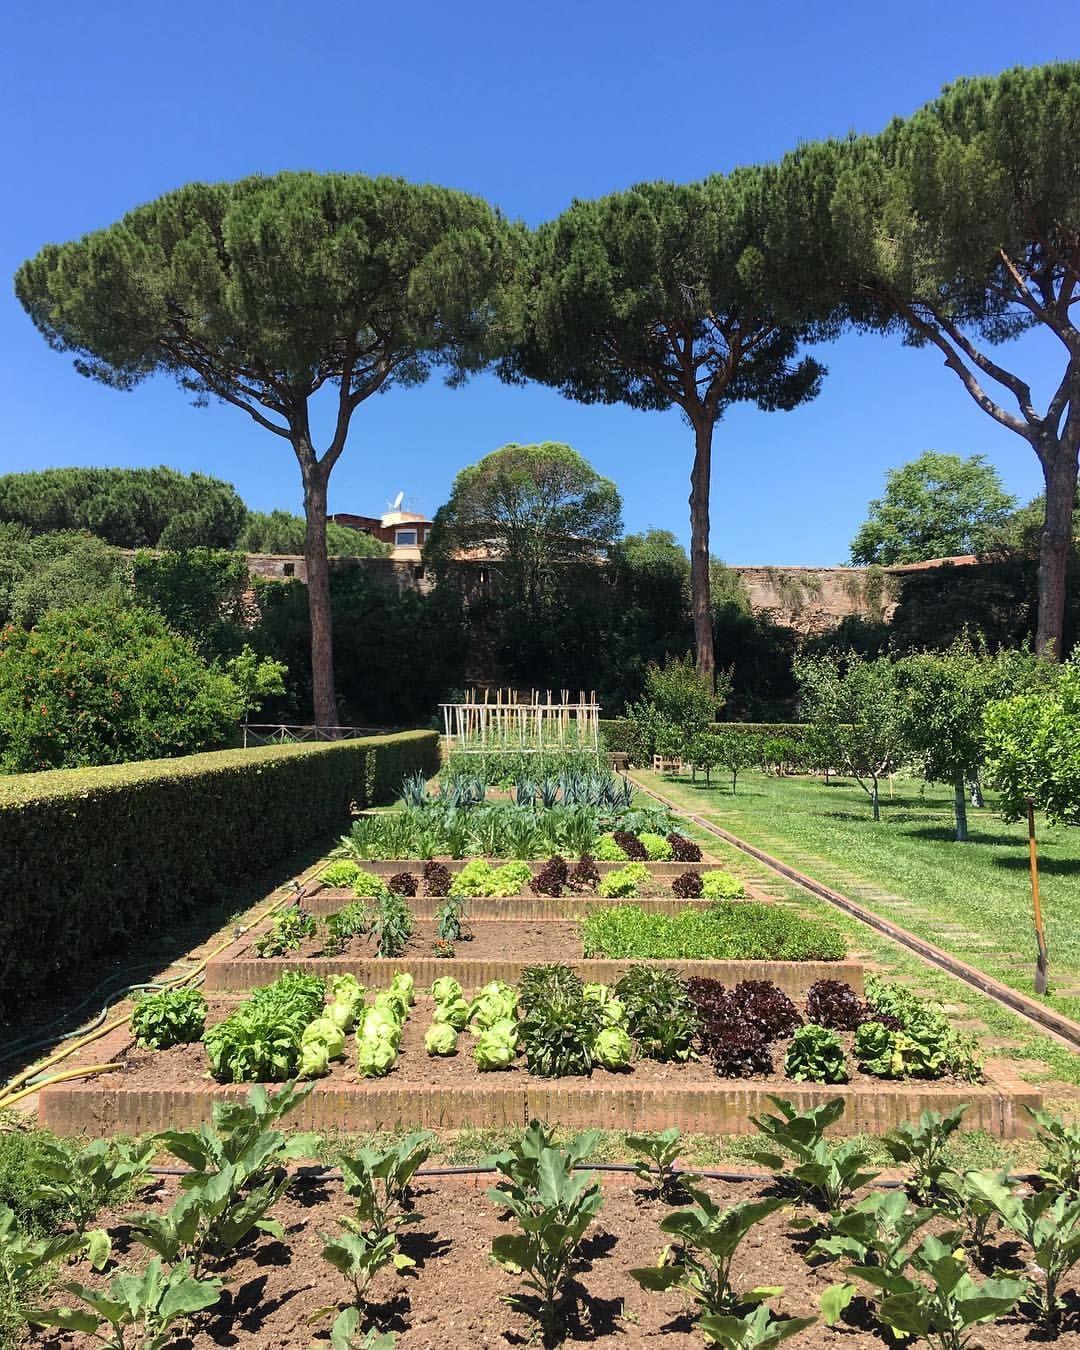 Kitchen Garden American Academy In Rome Italy